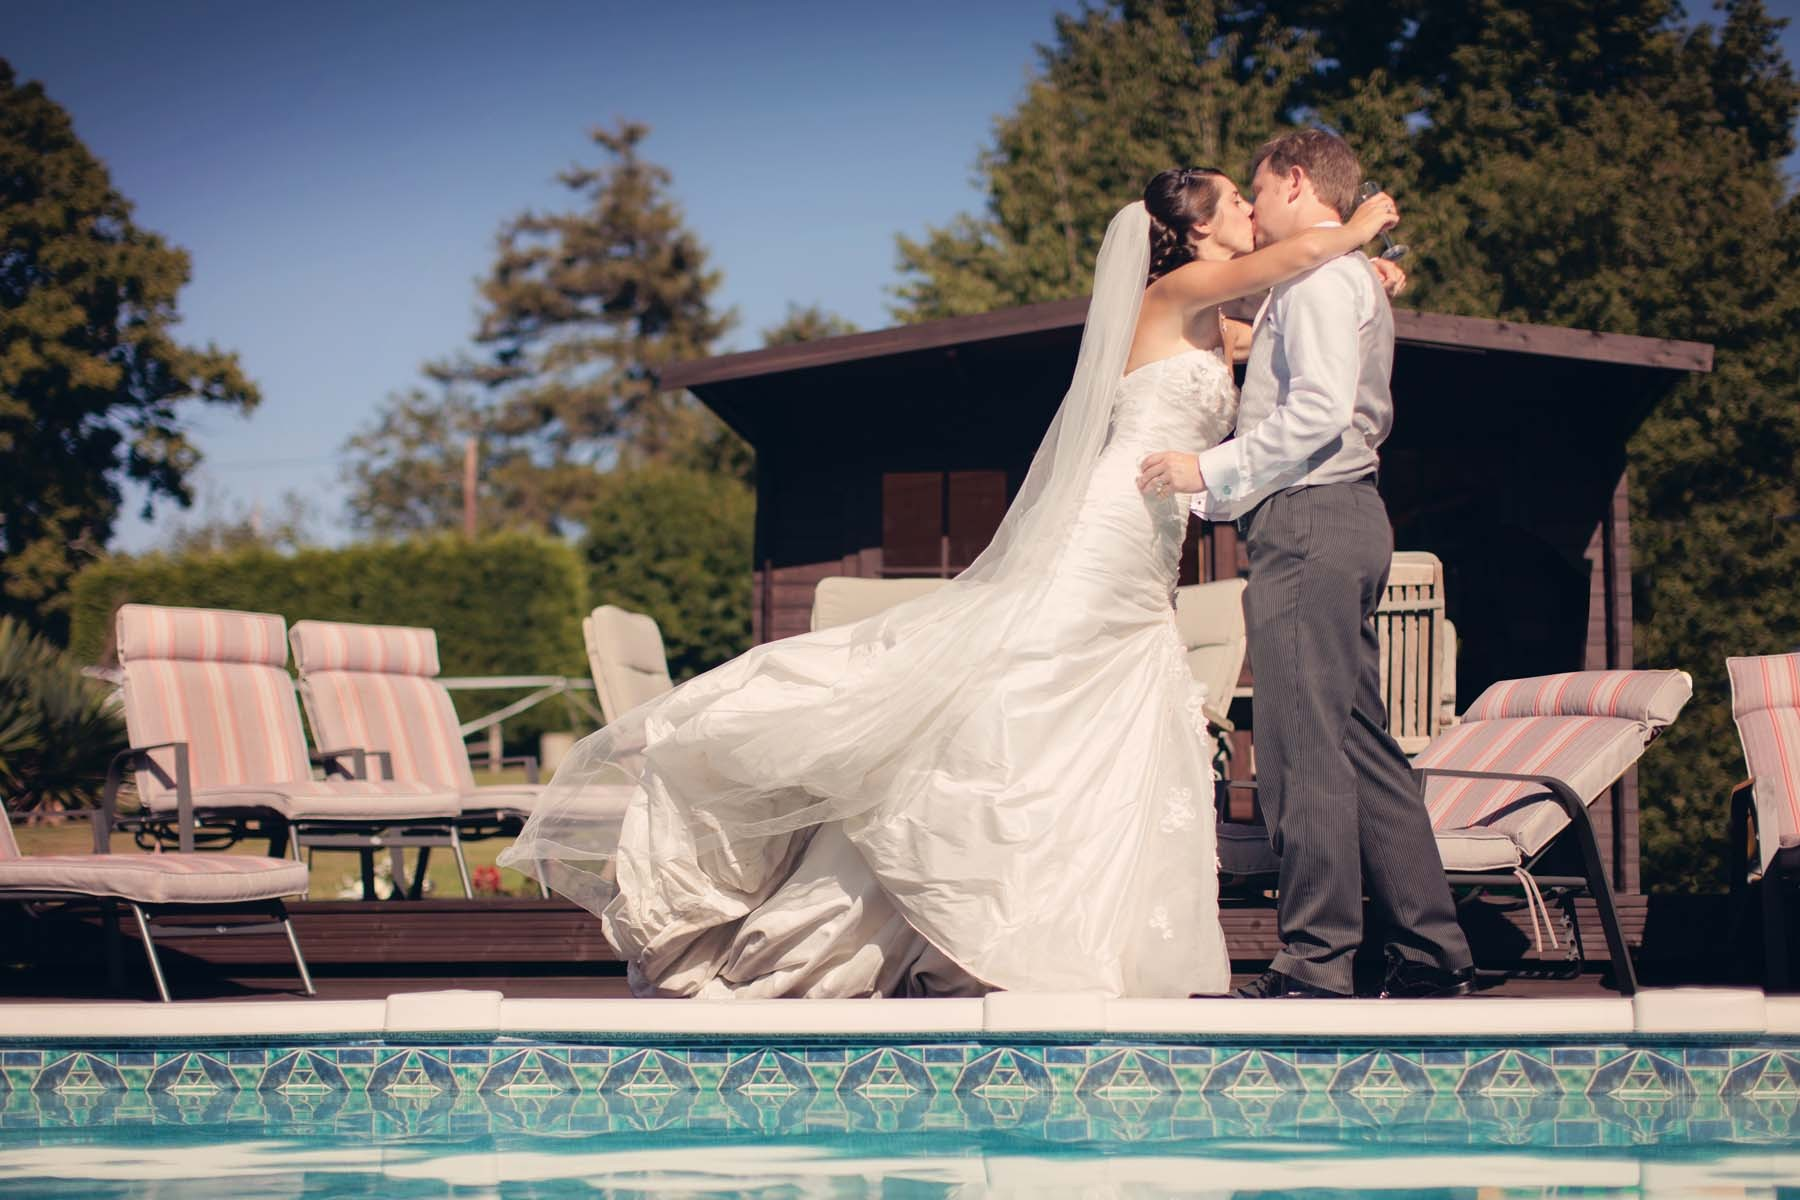 Sussex & Surrey Wedding Photographer - Bride & Groom (6)